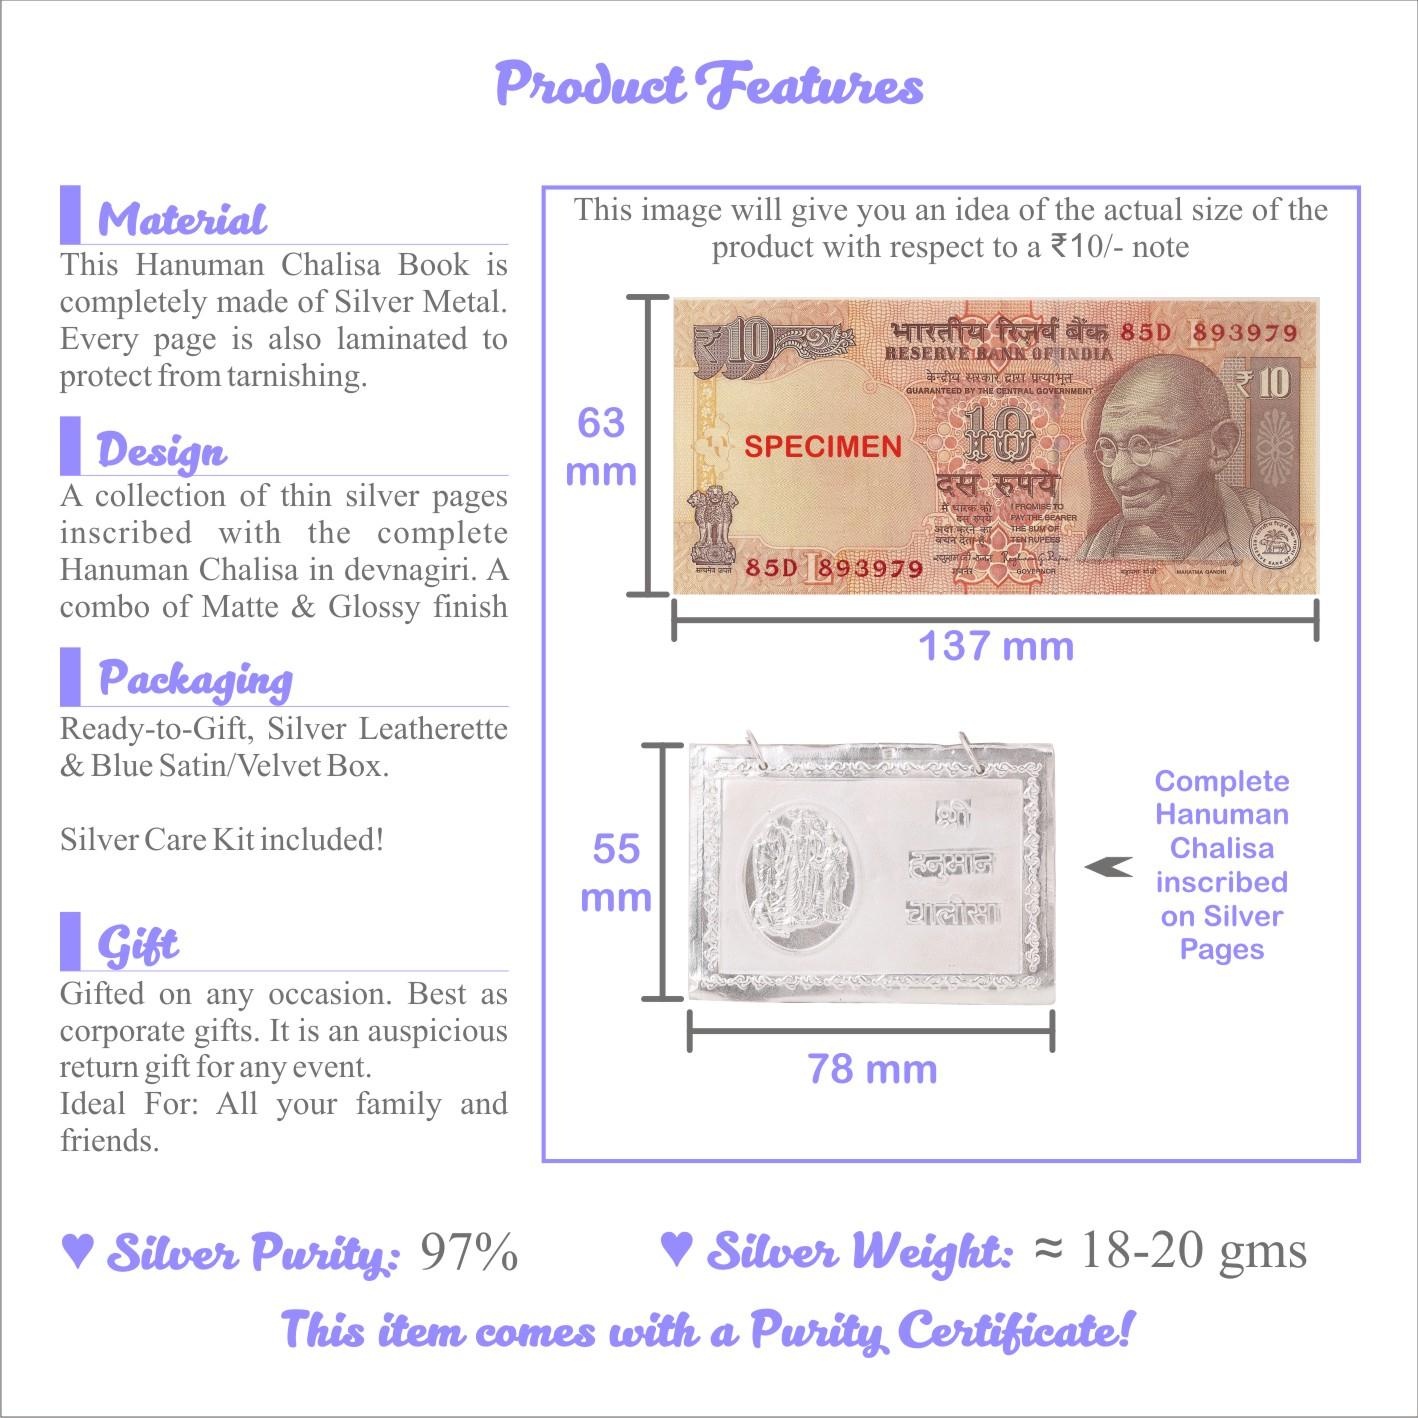 Osasbazaar Fine Silver Hanuman Chalisa Book - Features